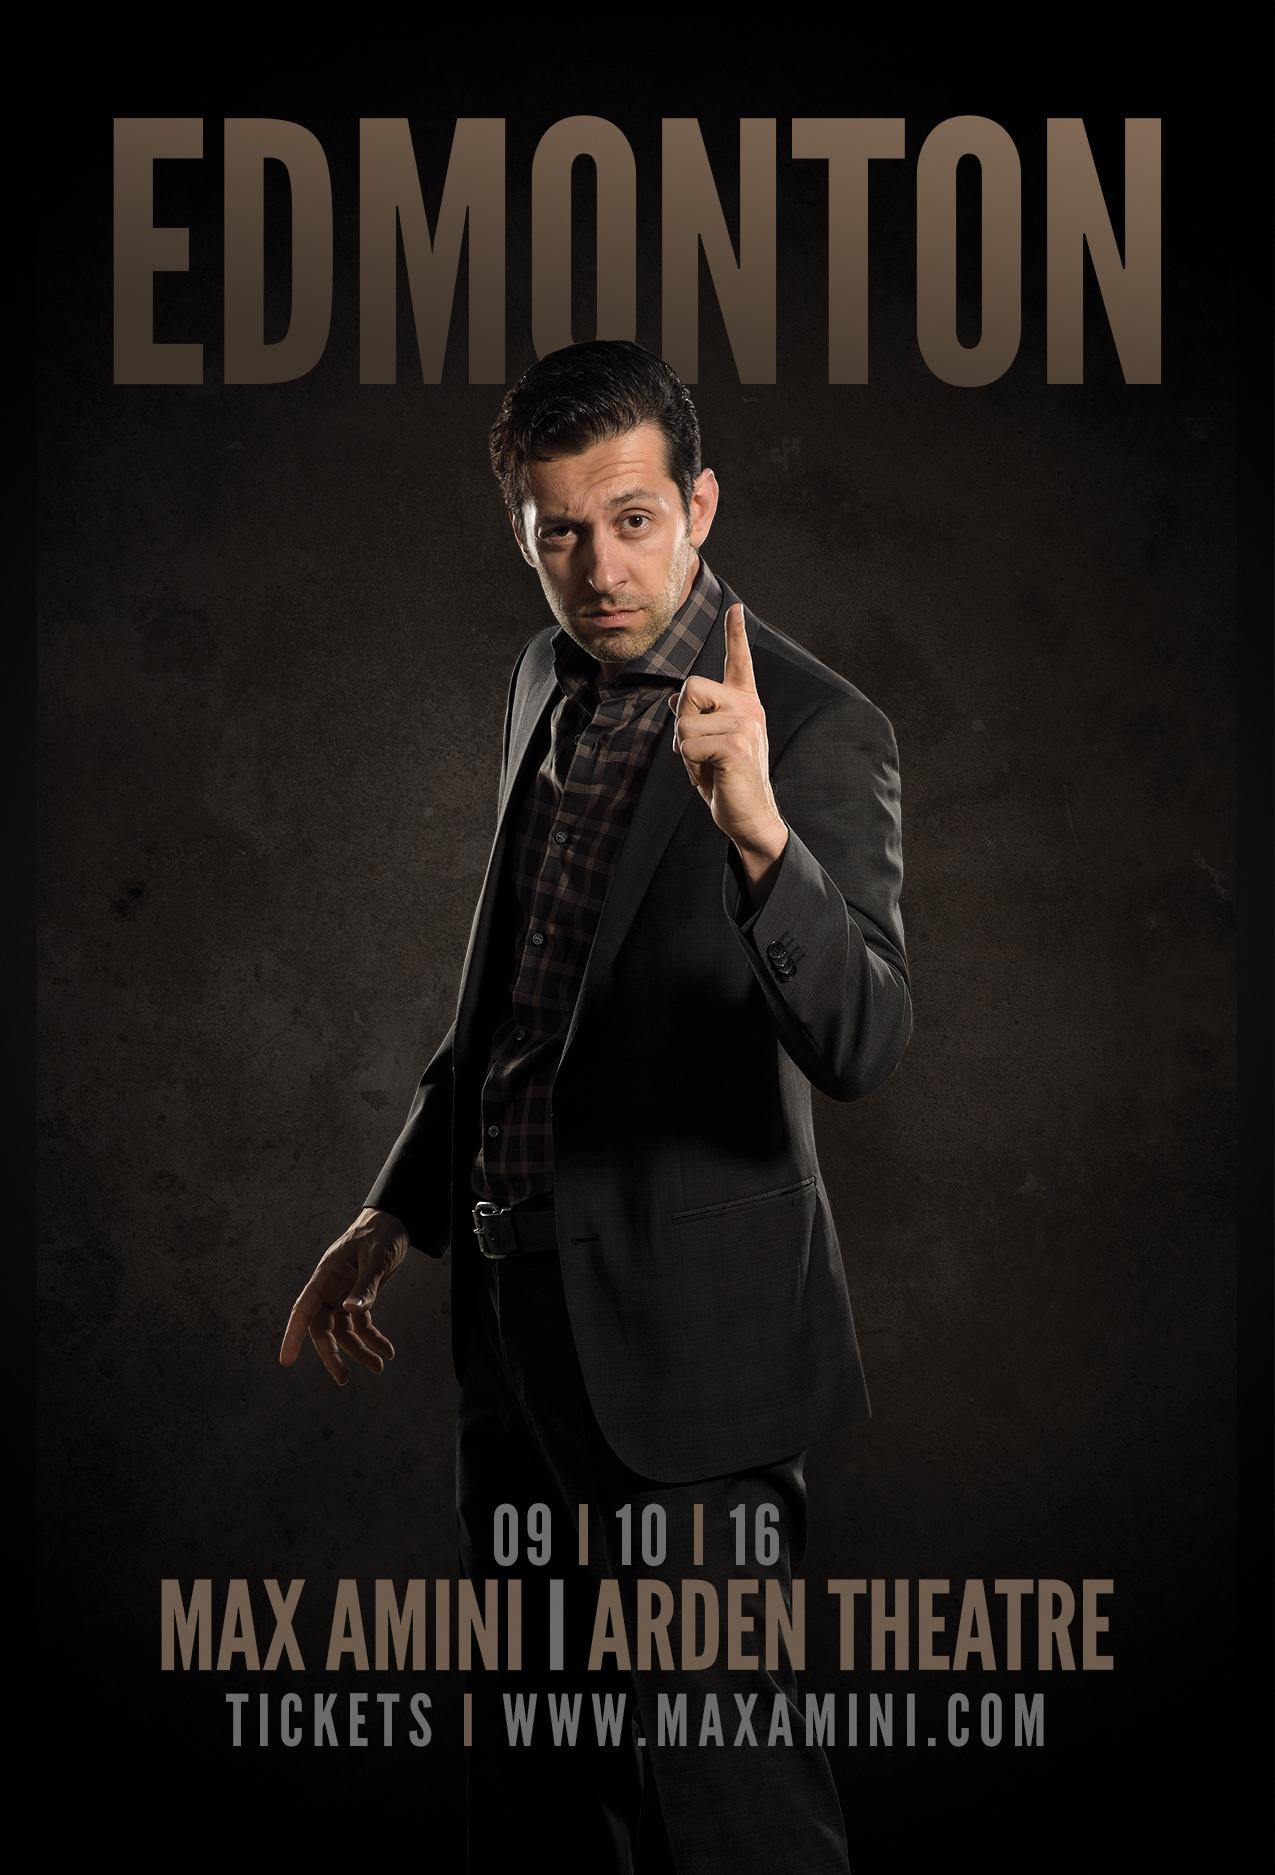 Edmonton_070116_4x6_Front.jpg